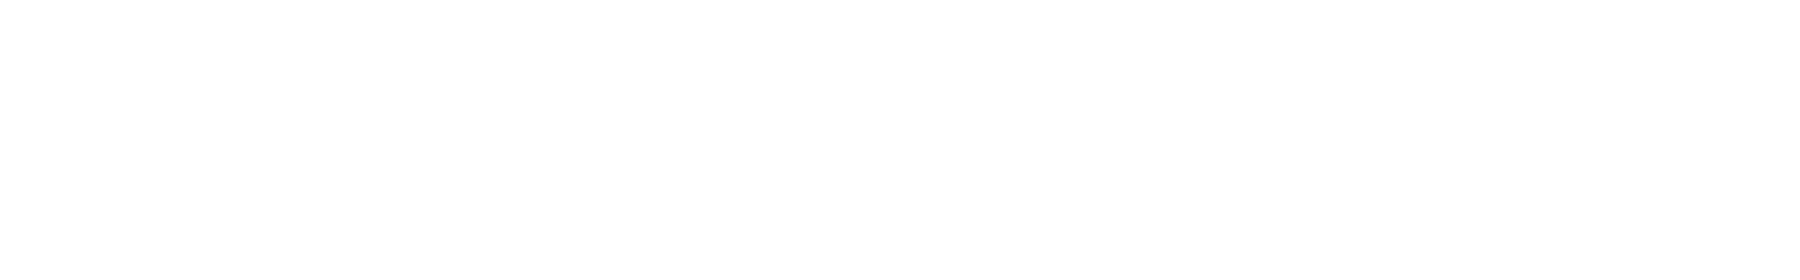 g abs05 093